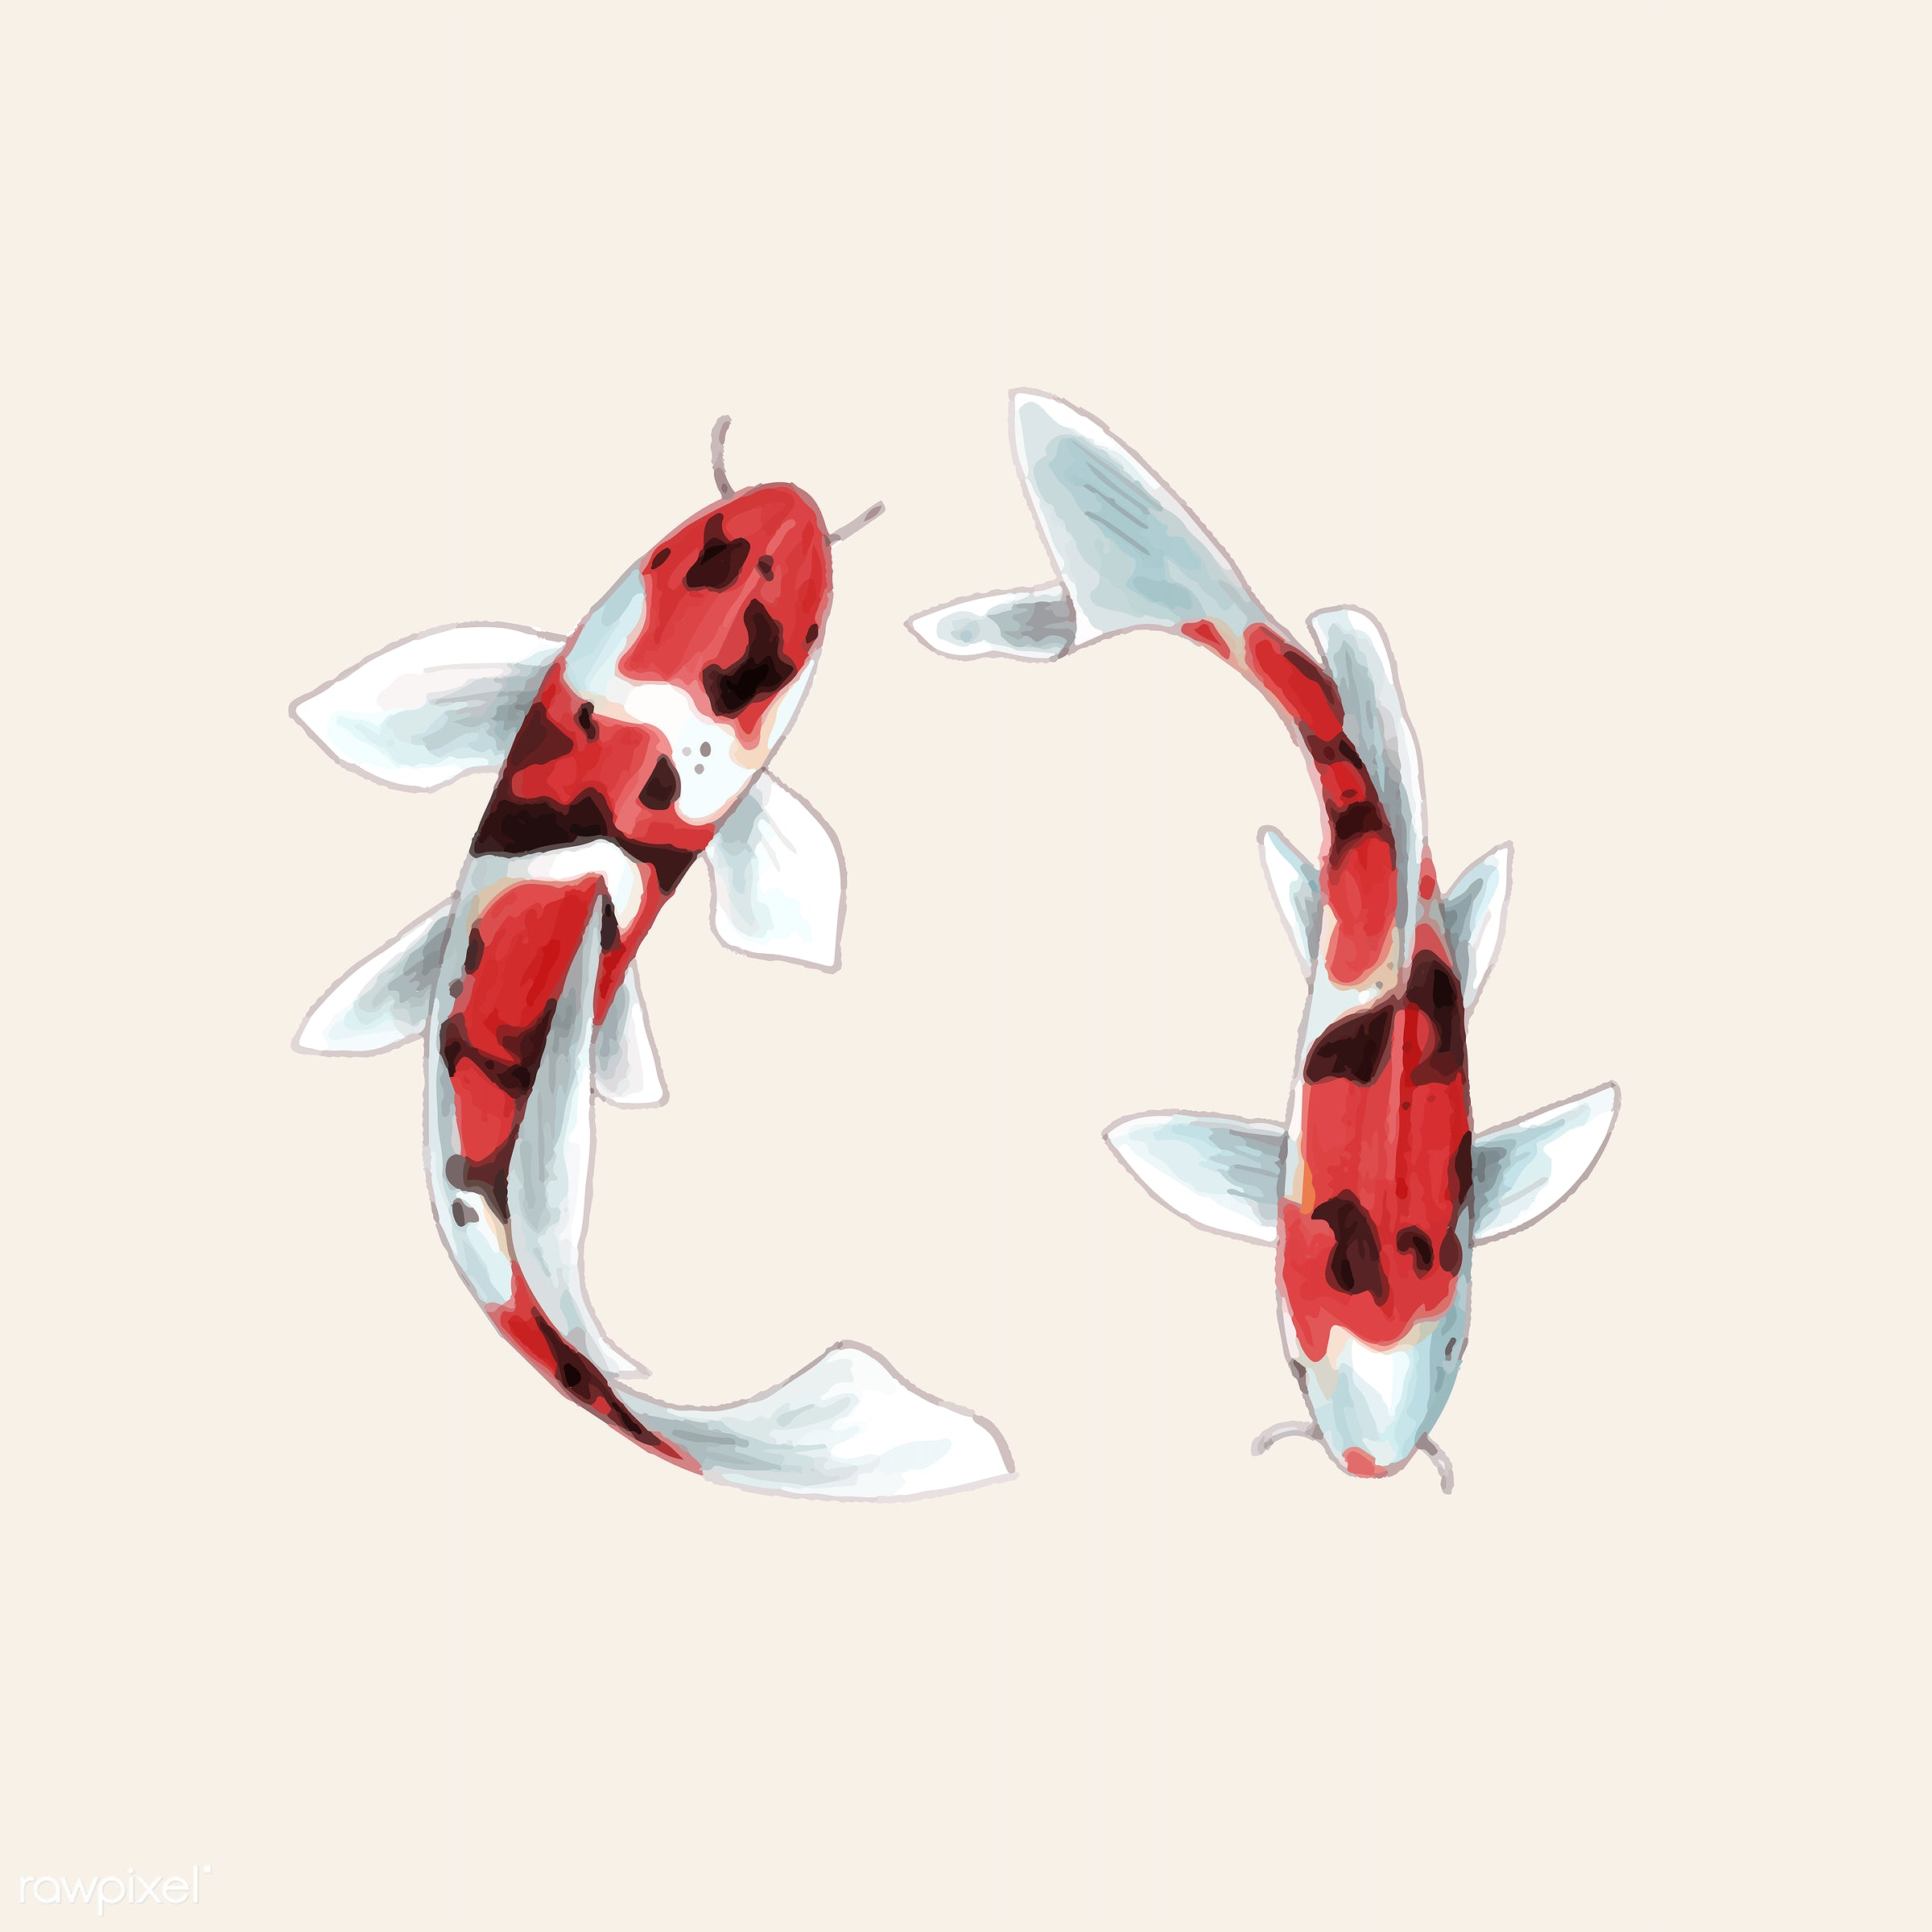 Illustration of Japanese Koi fish - ID: 416976